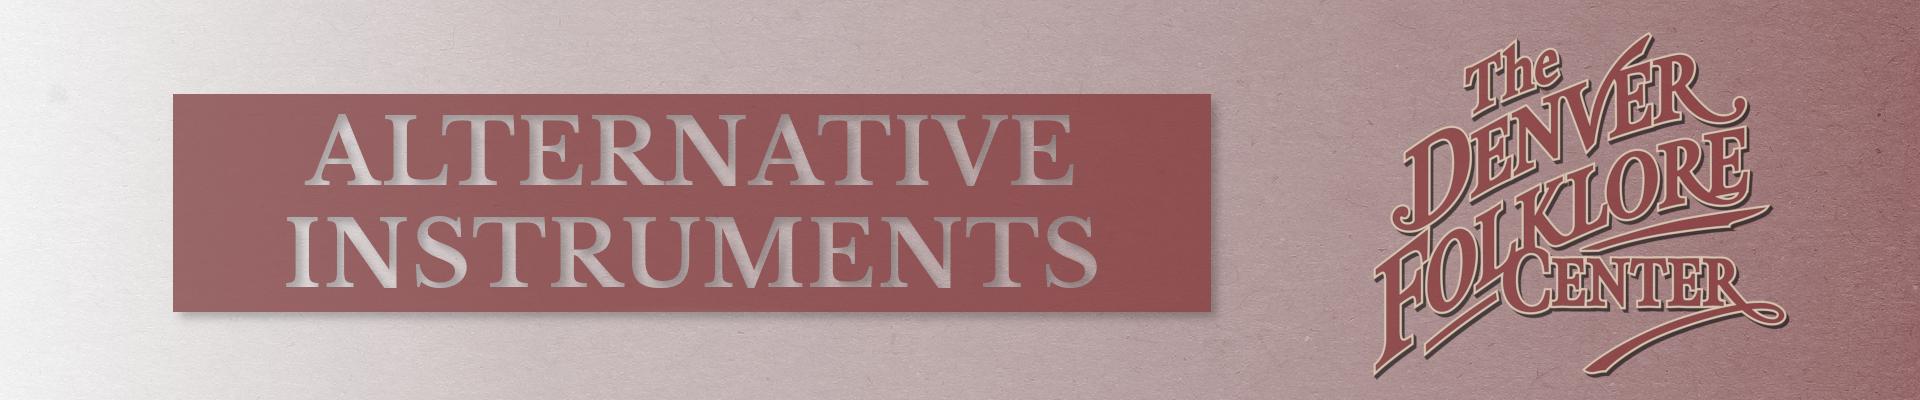 ALTERNATIVE INSTRUMENTS